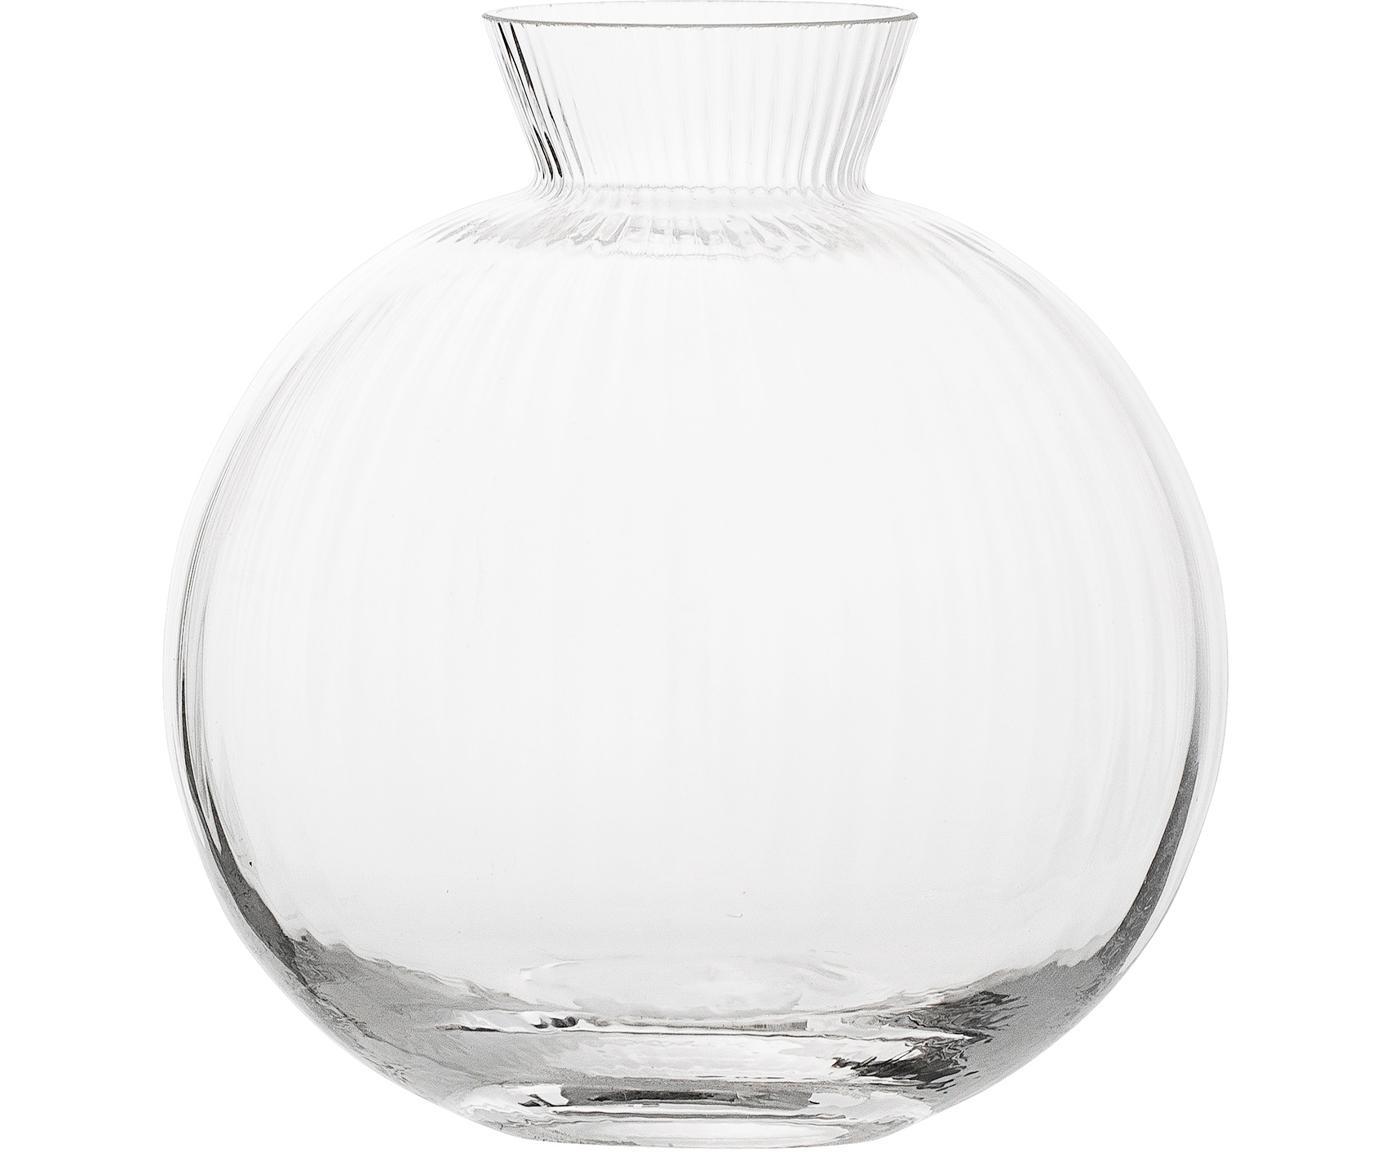 Wazon ze szkła Visible, Szkło, Transparentny, Ø 11 x W 12 cm